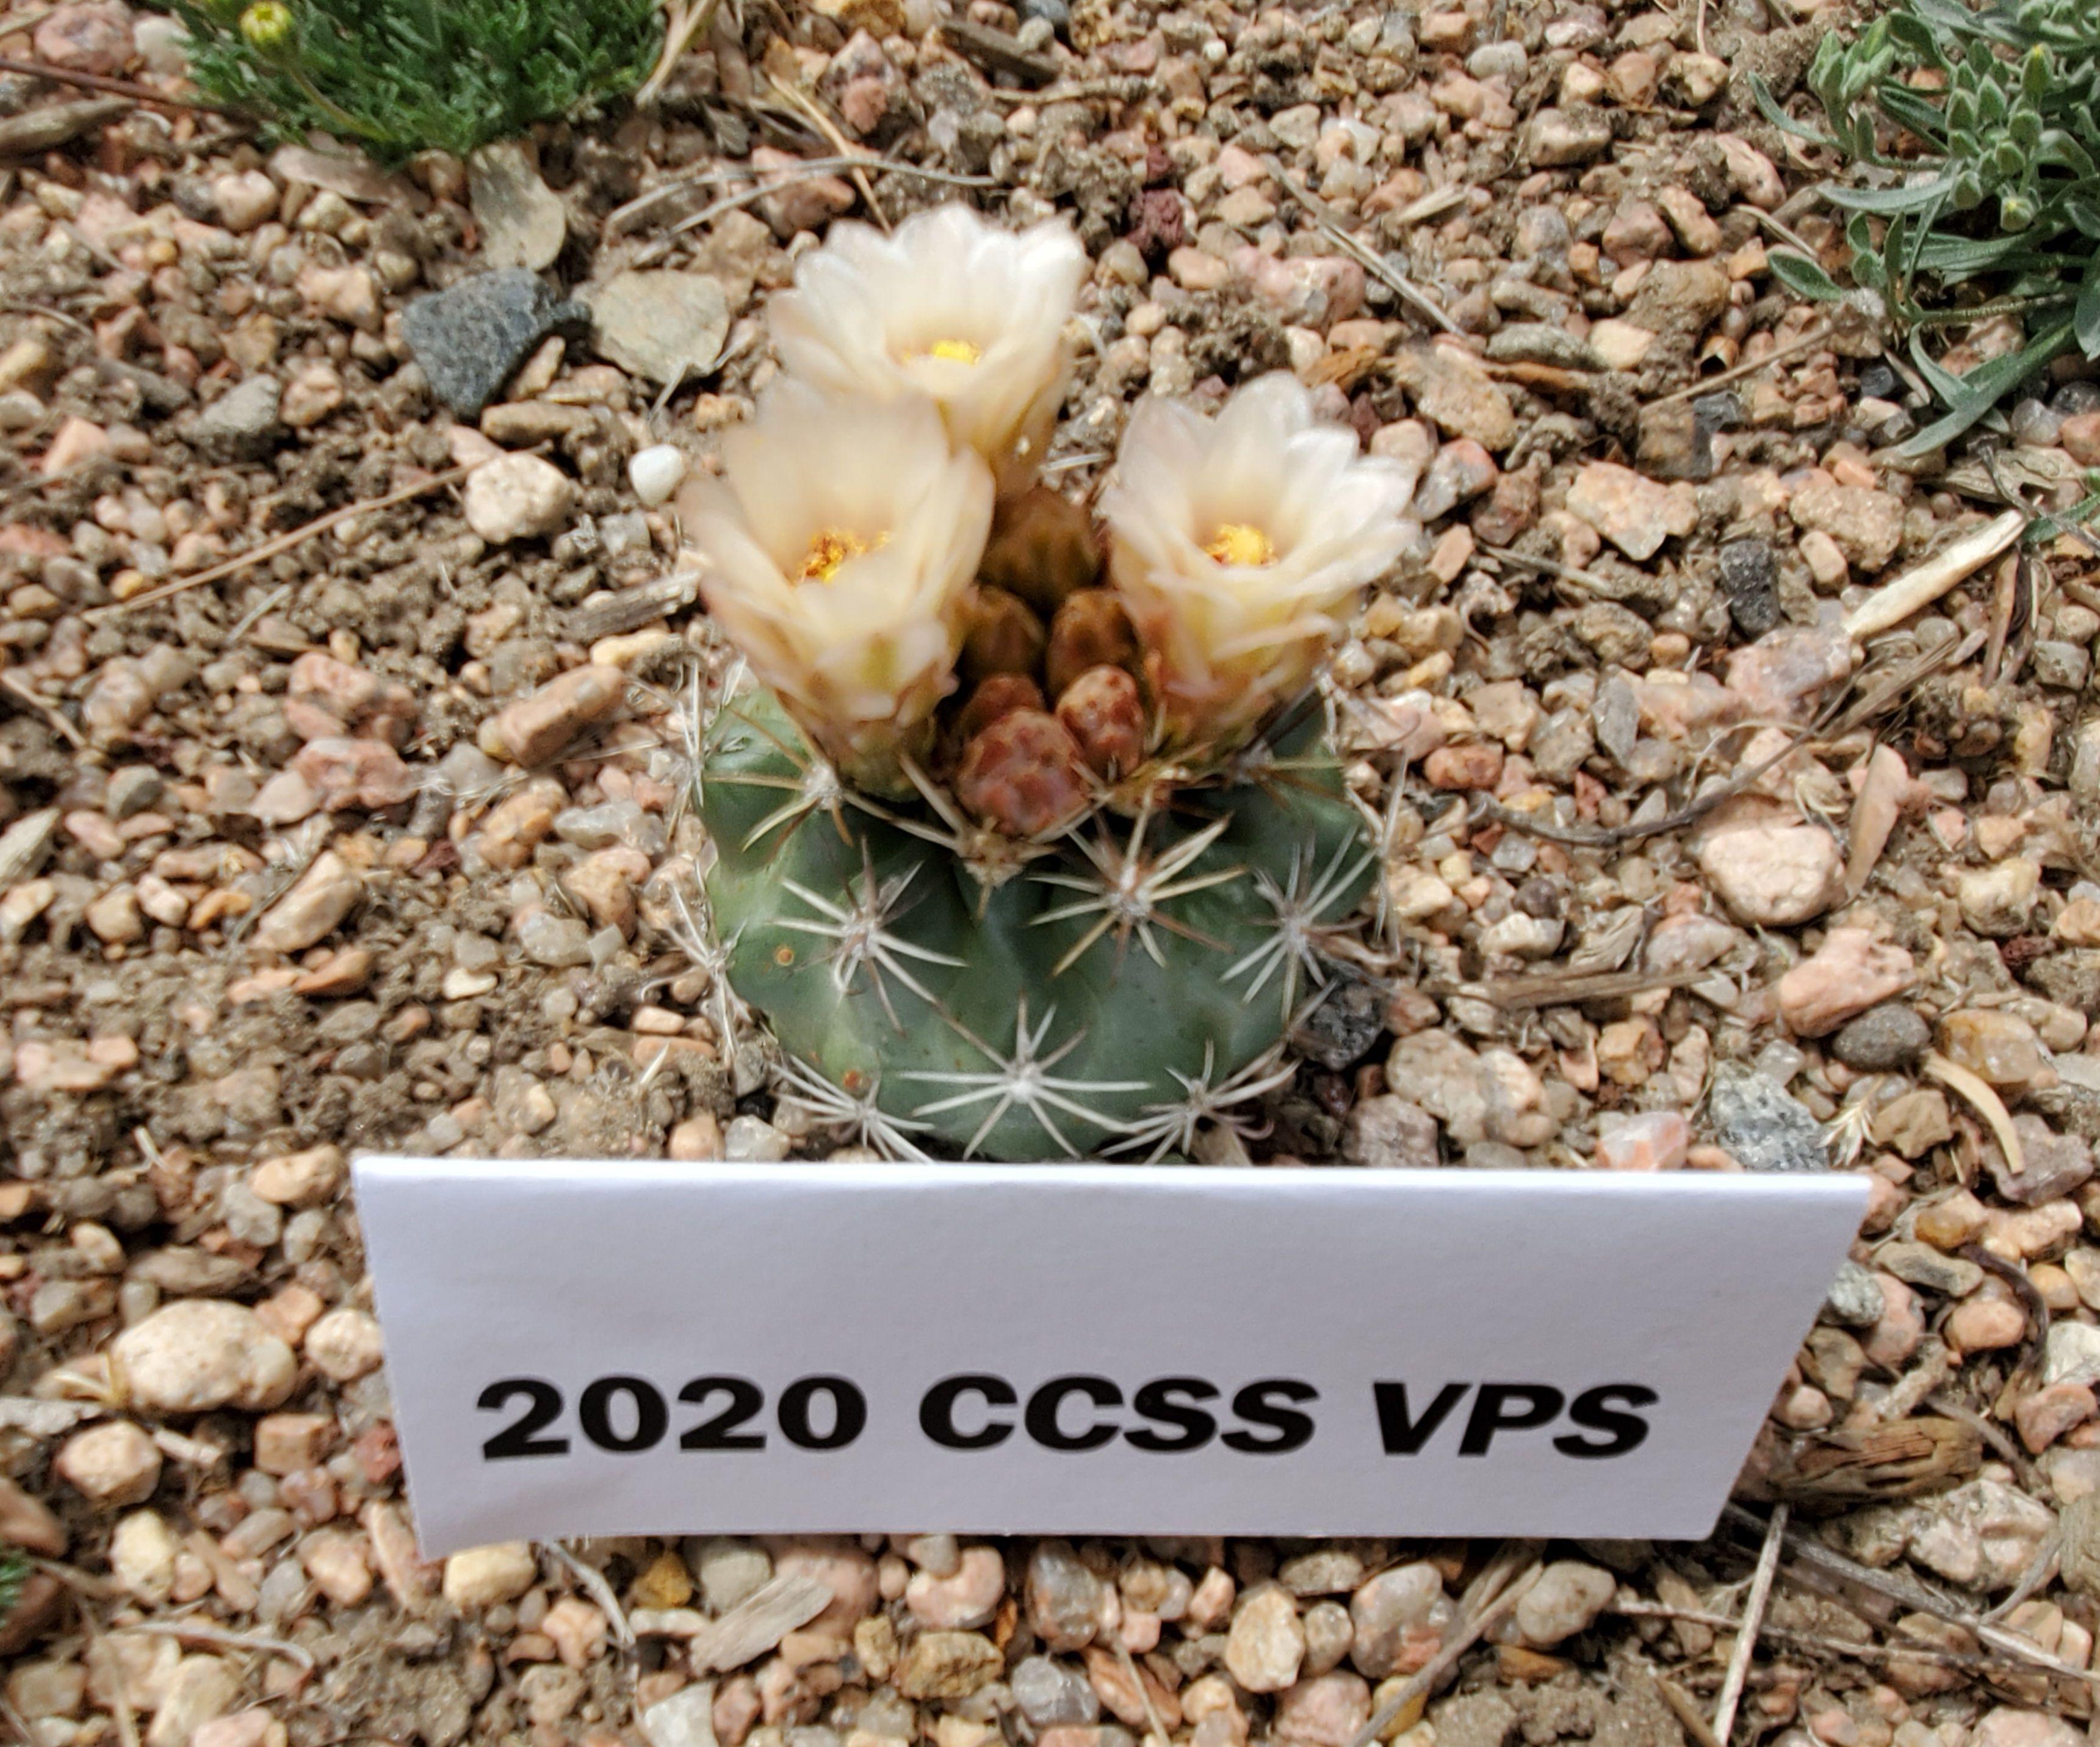 Sclercactus parviflorus